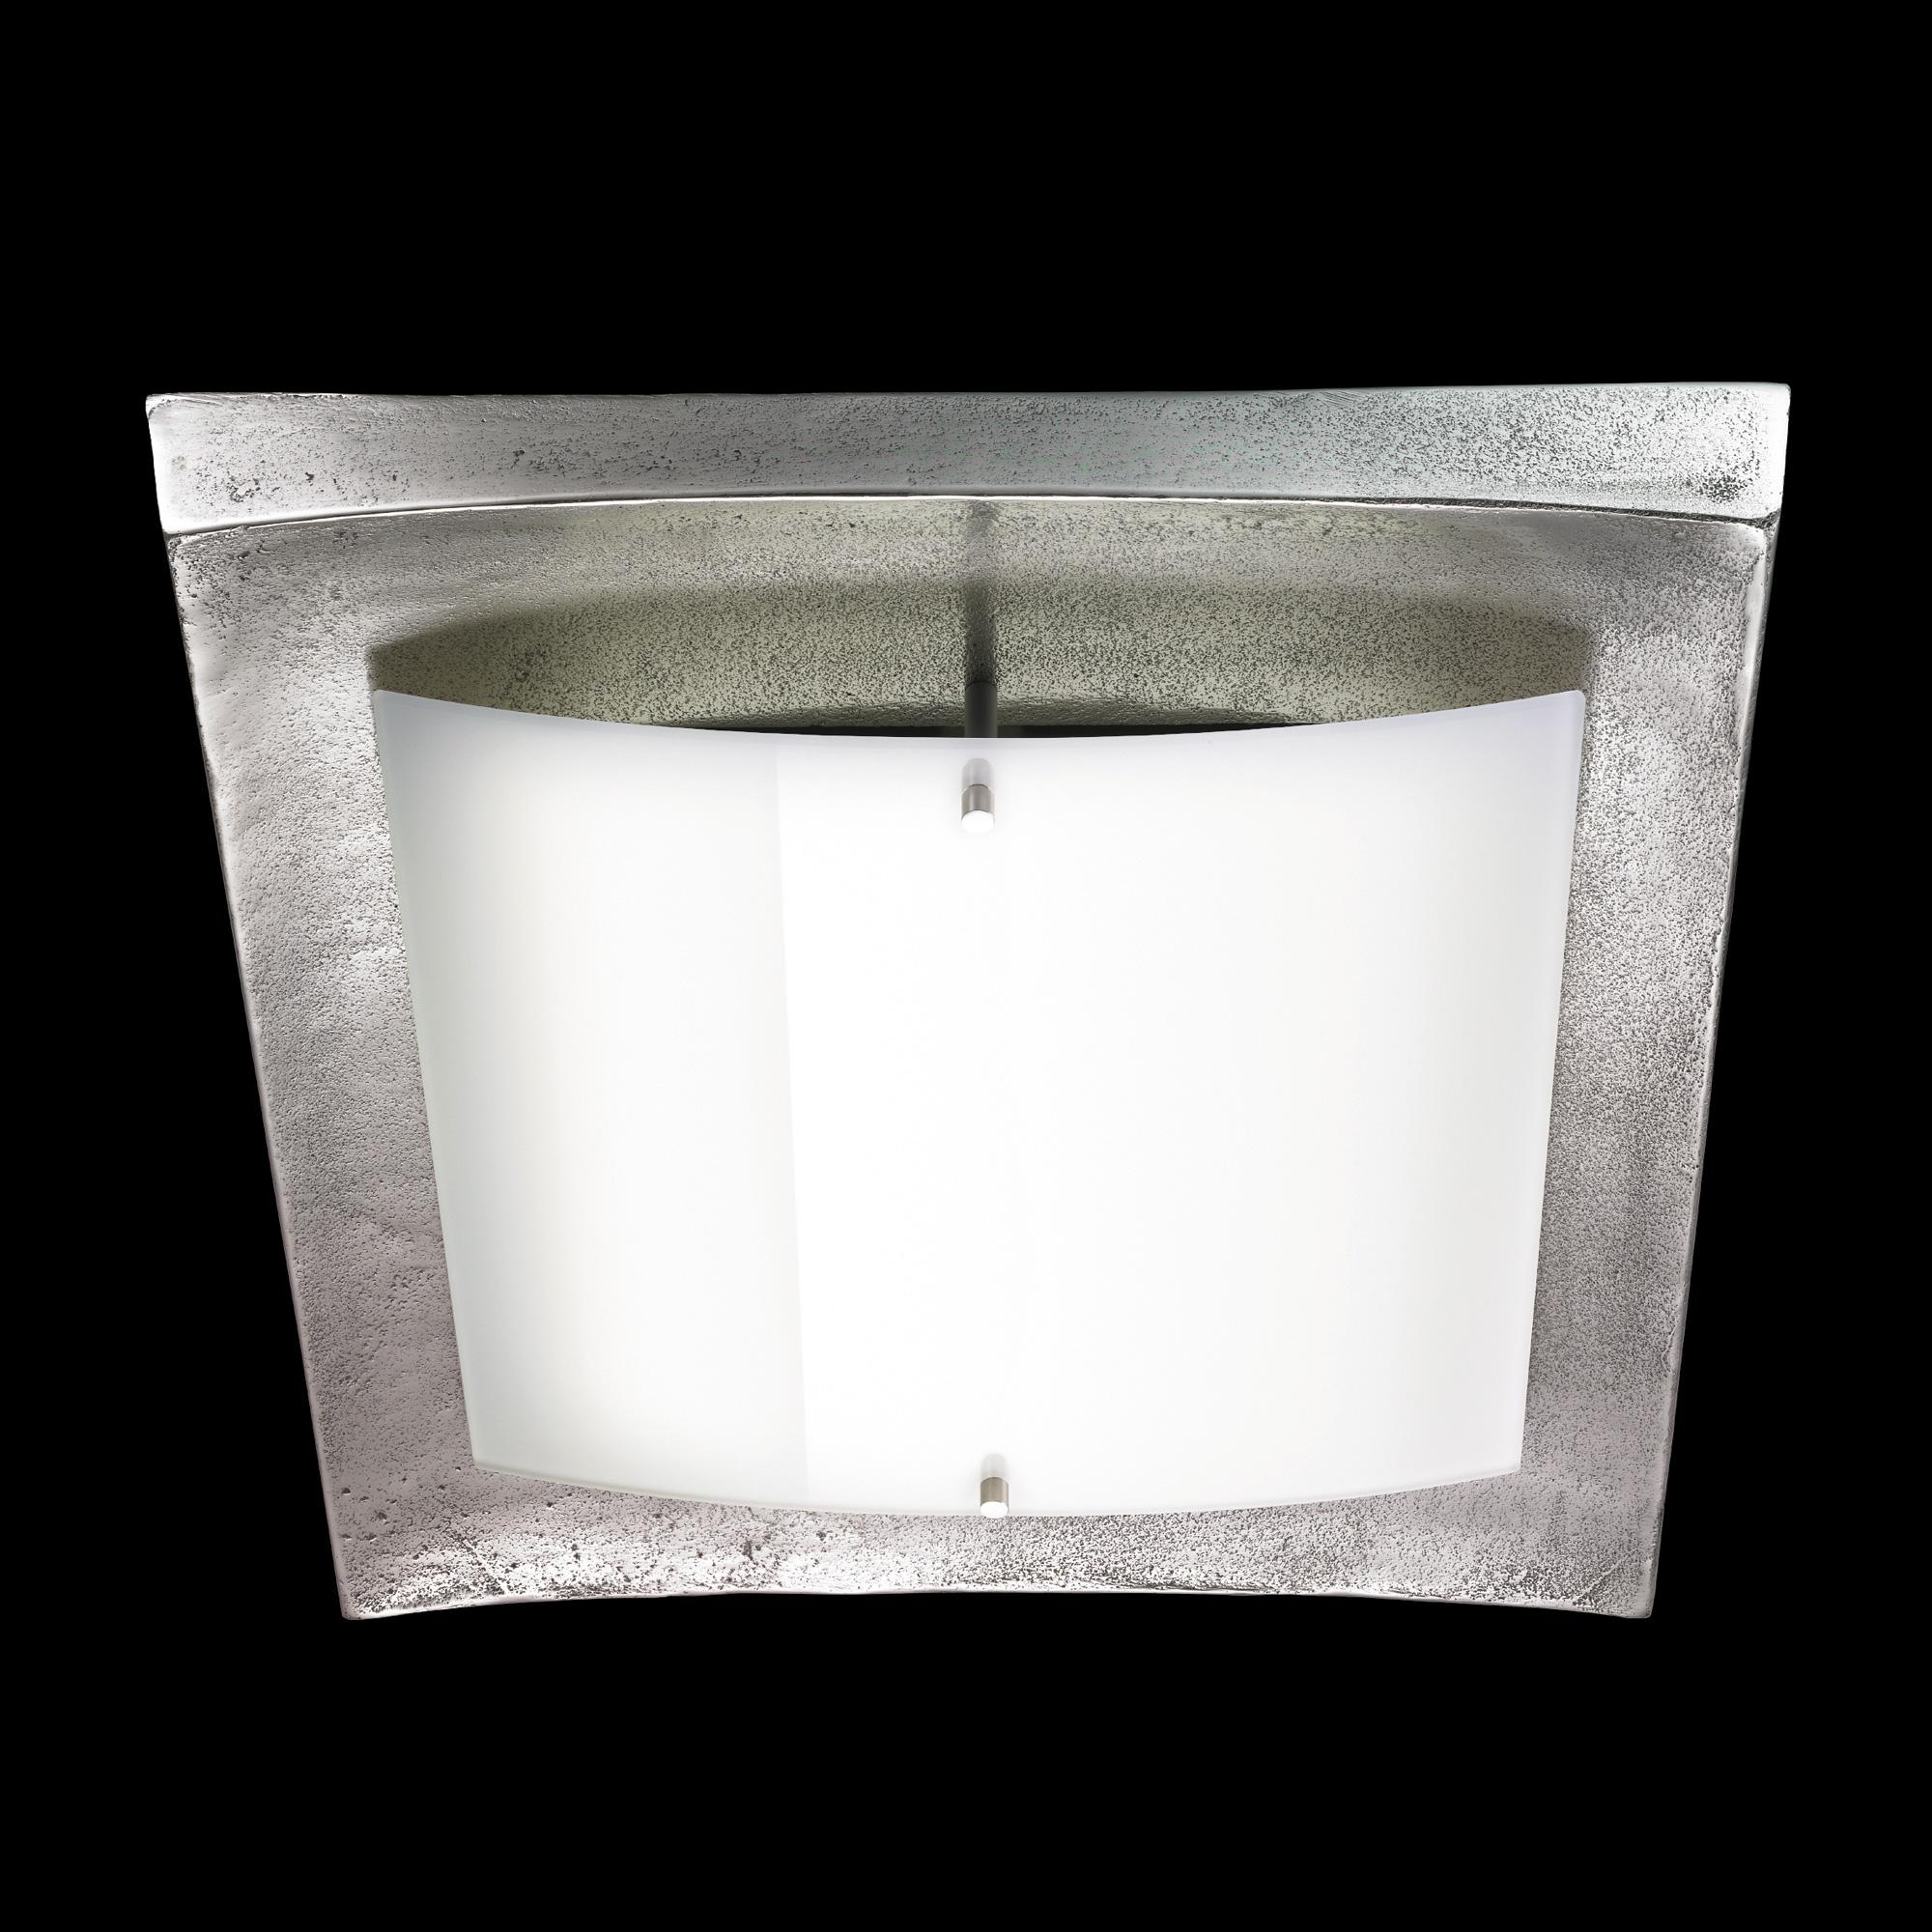 shine by fischer 51500 led deckenleuchte 51571 reuter onlineshop. Black Bedroom Furniture Sets. Home Design Ideas